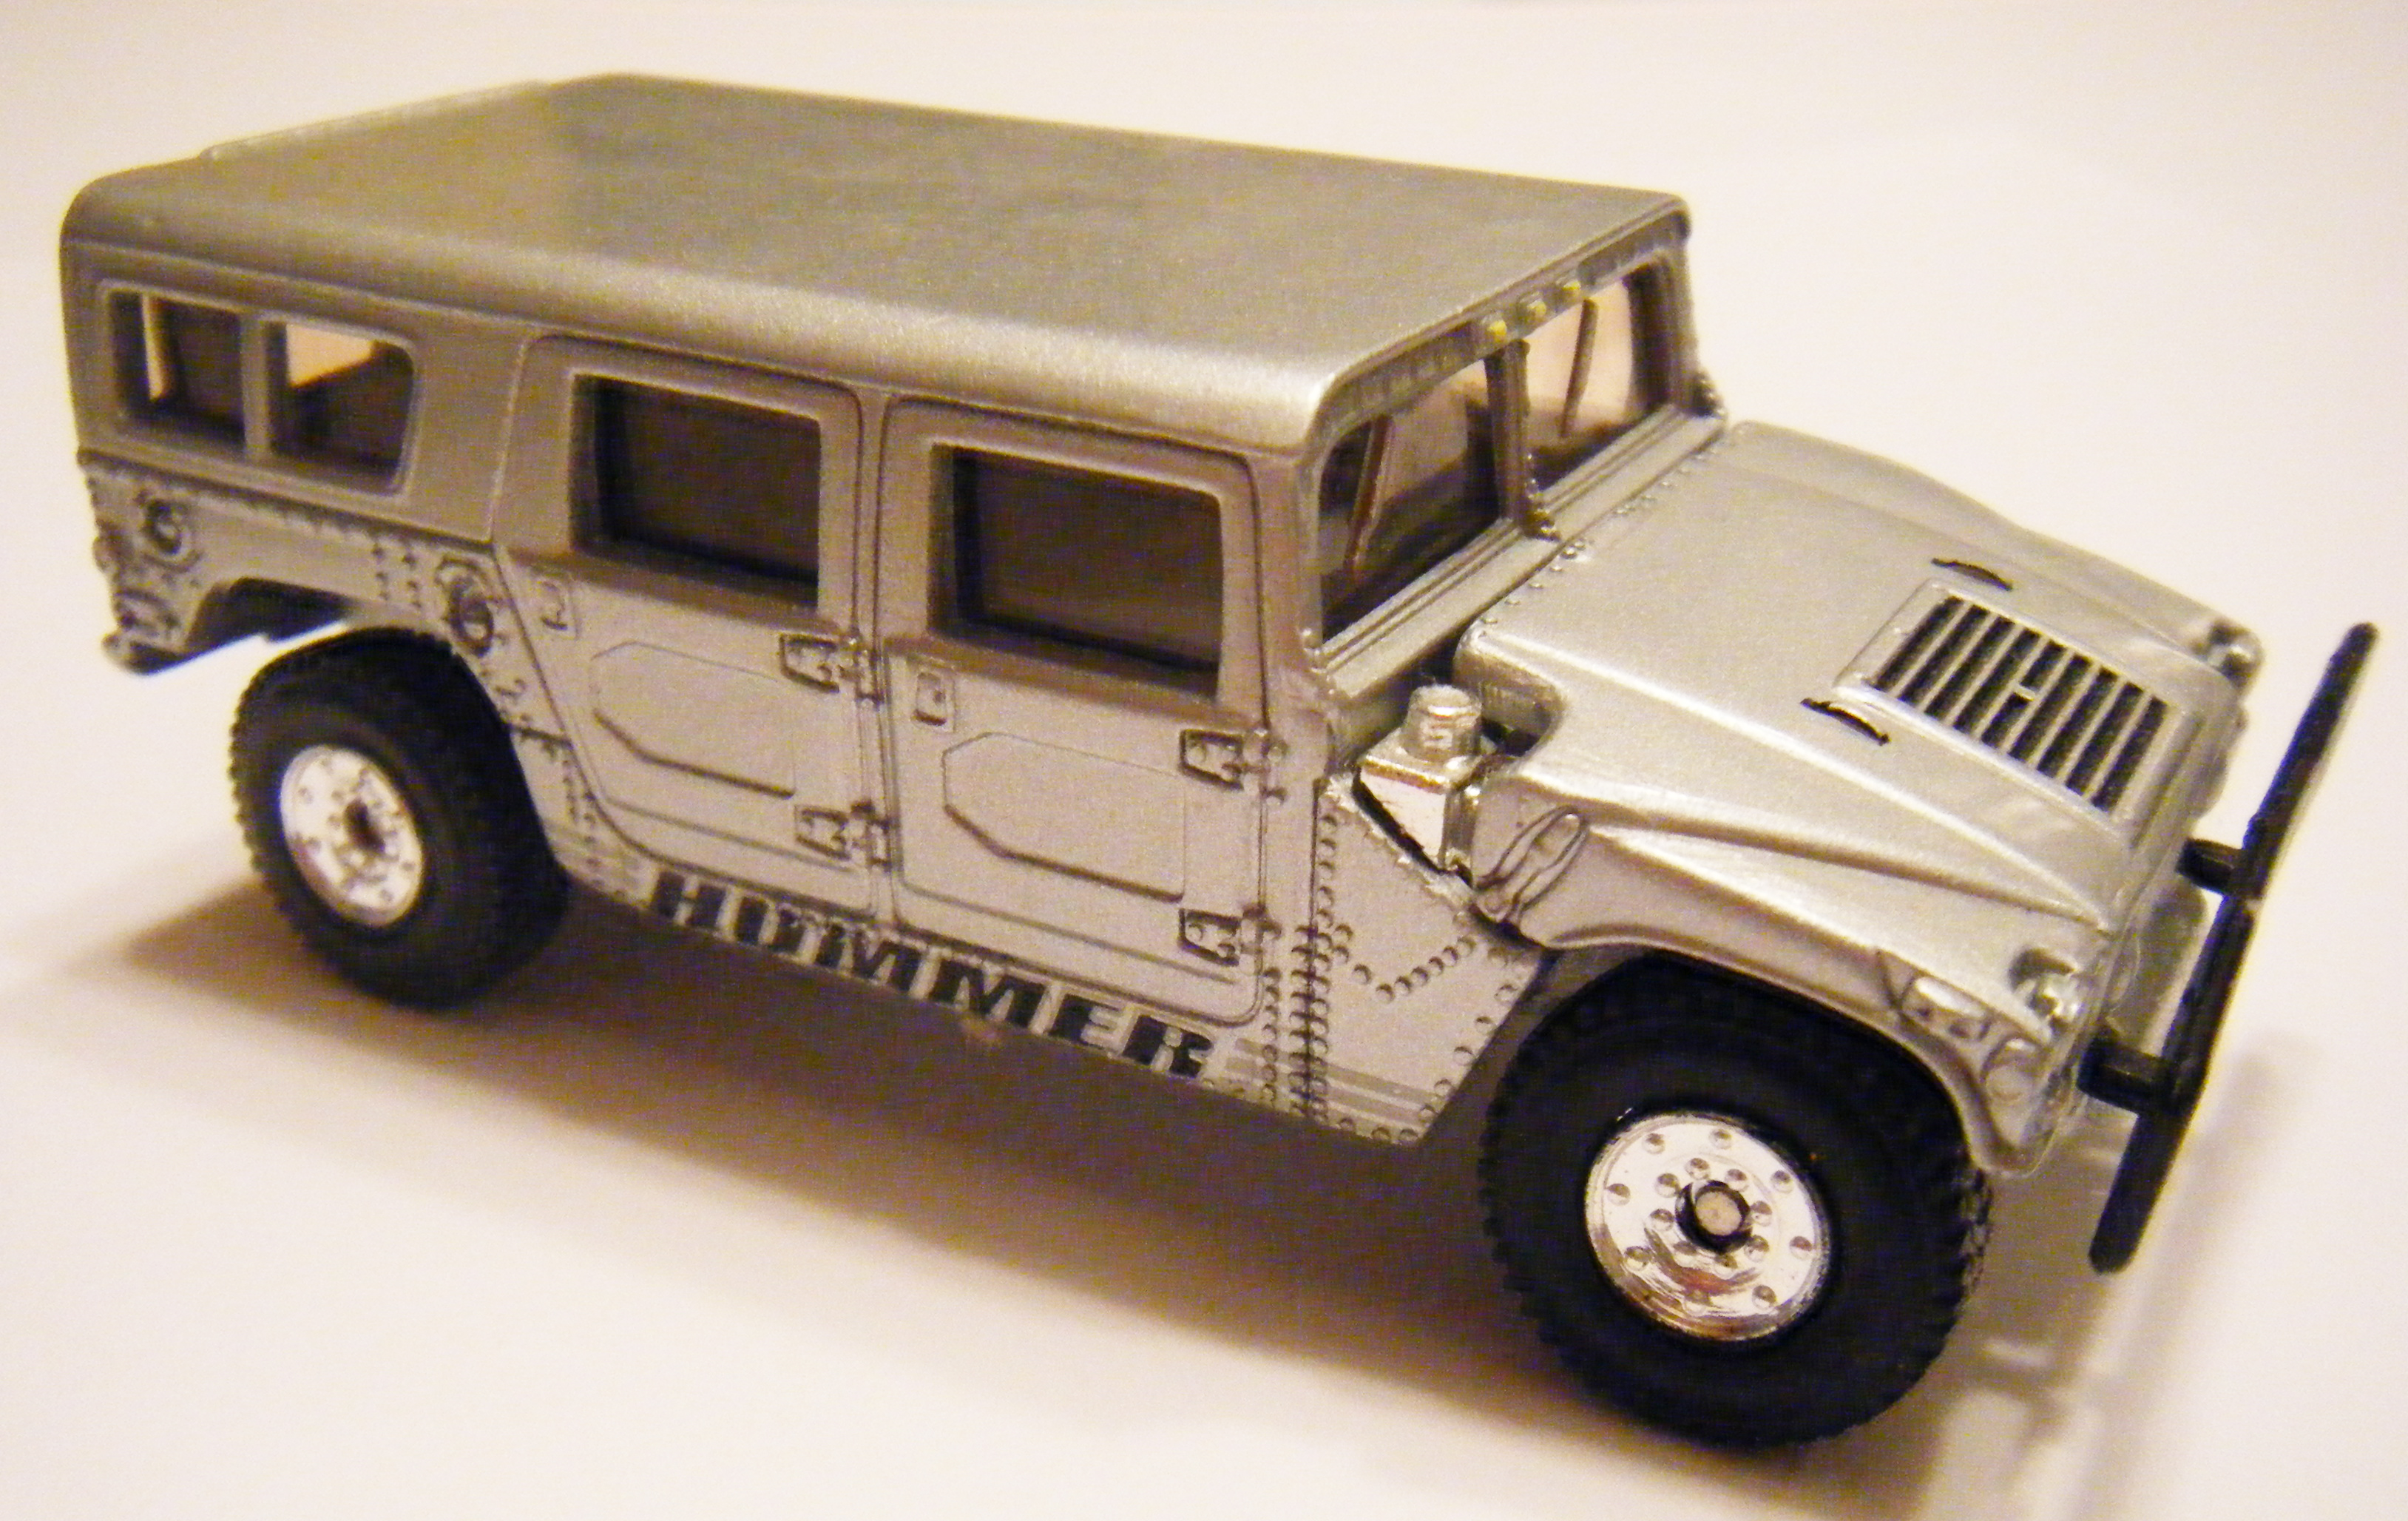 Hummer 2000 Hot Wheels Wiki